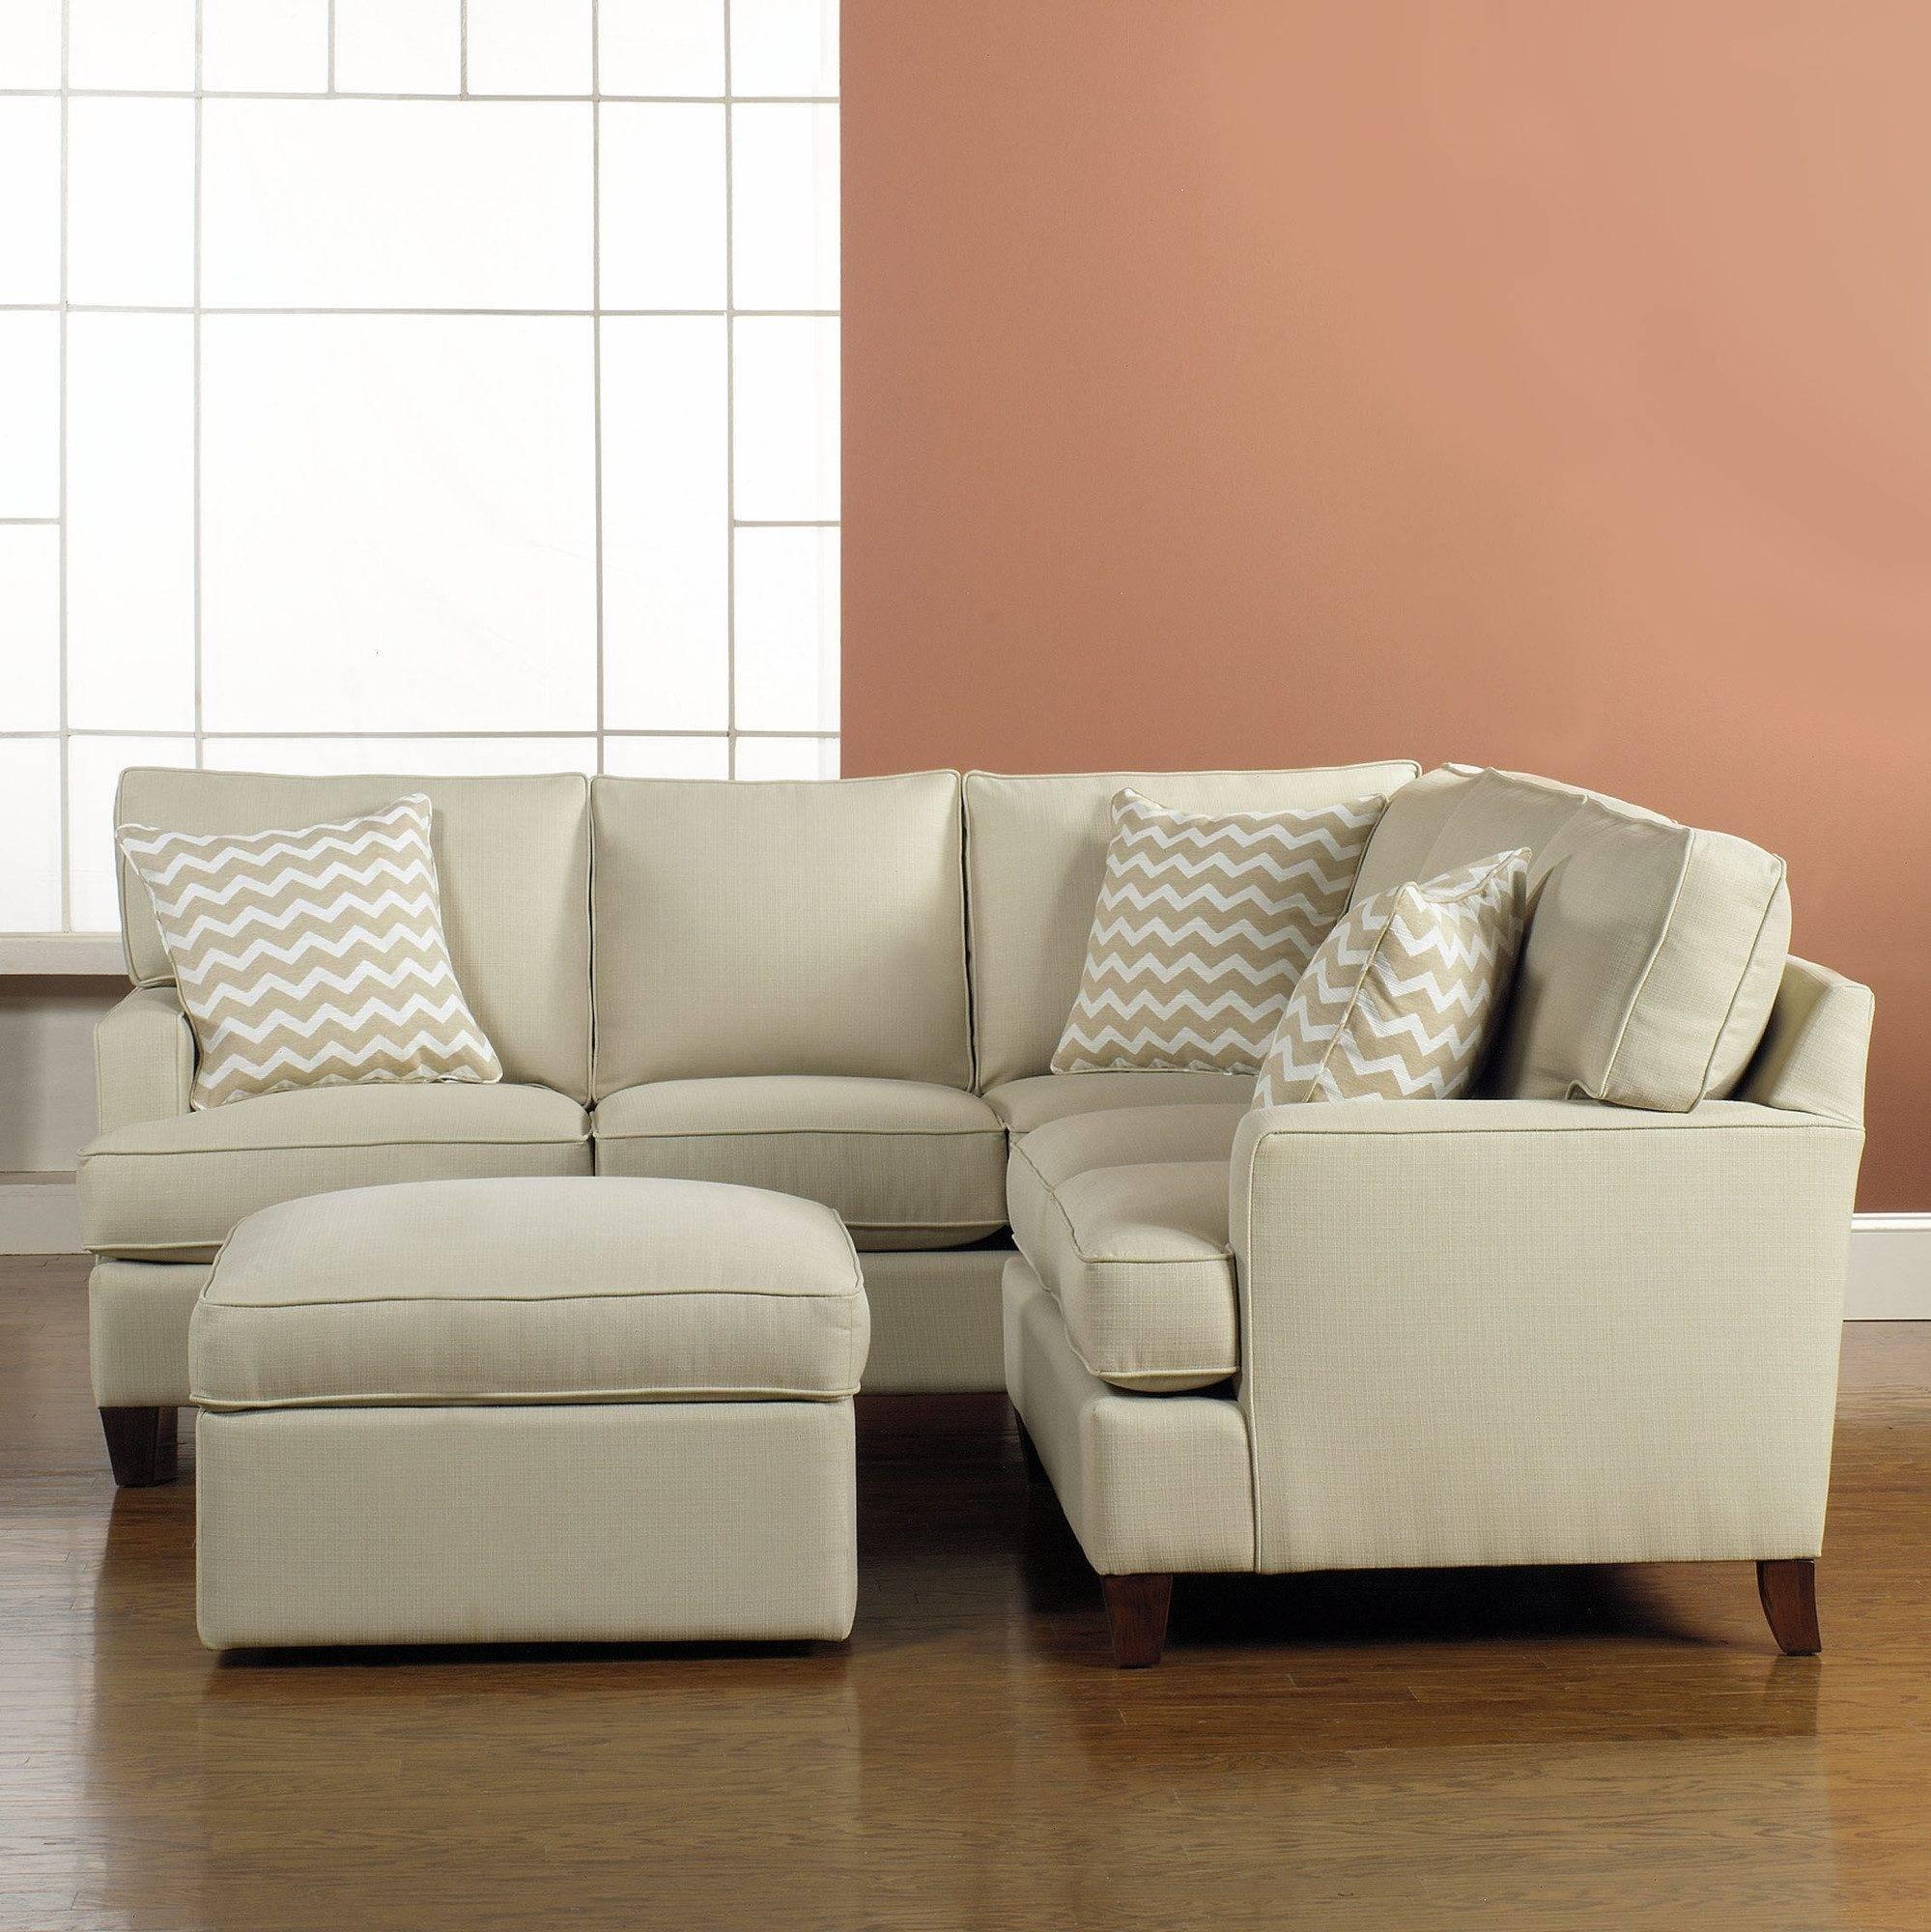 High Legged Corner Sofa For Small Spaces